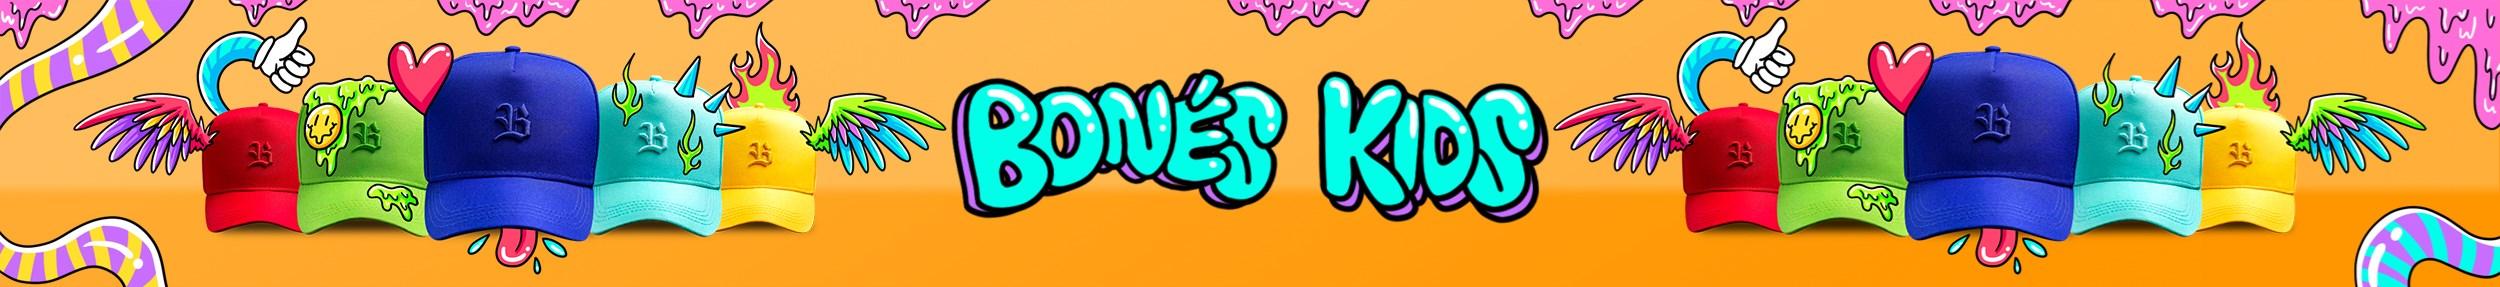 Bonés Slim / Kids Blck Brasil